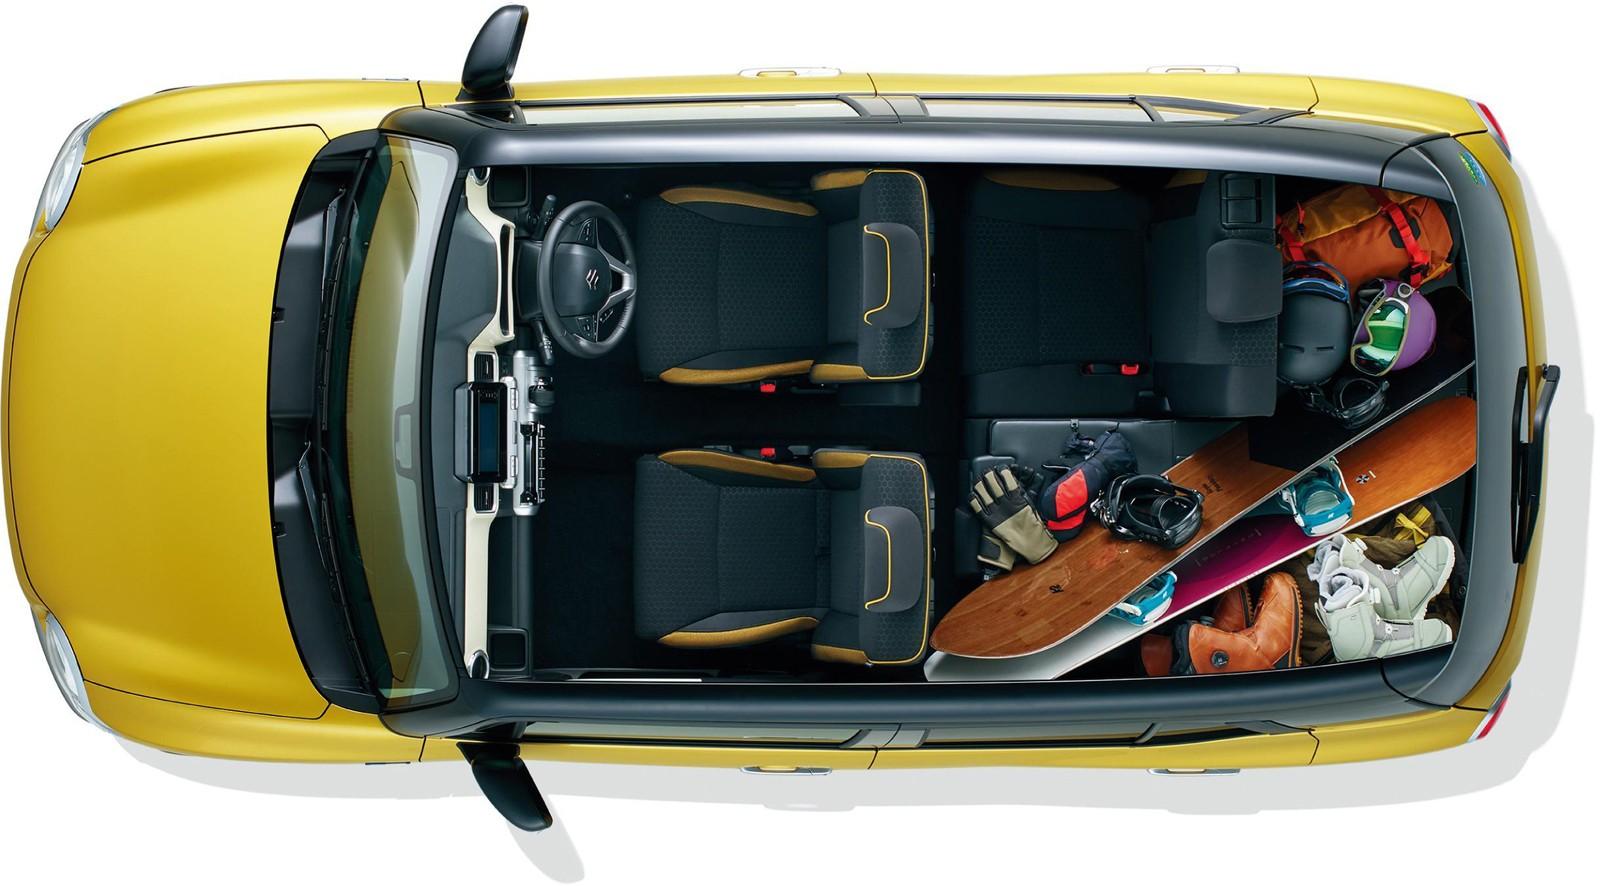 Suzuki Xbee Top View Kei Car